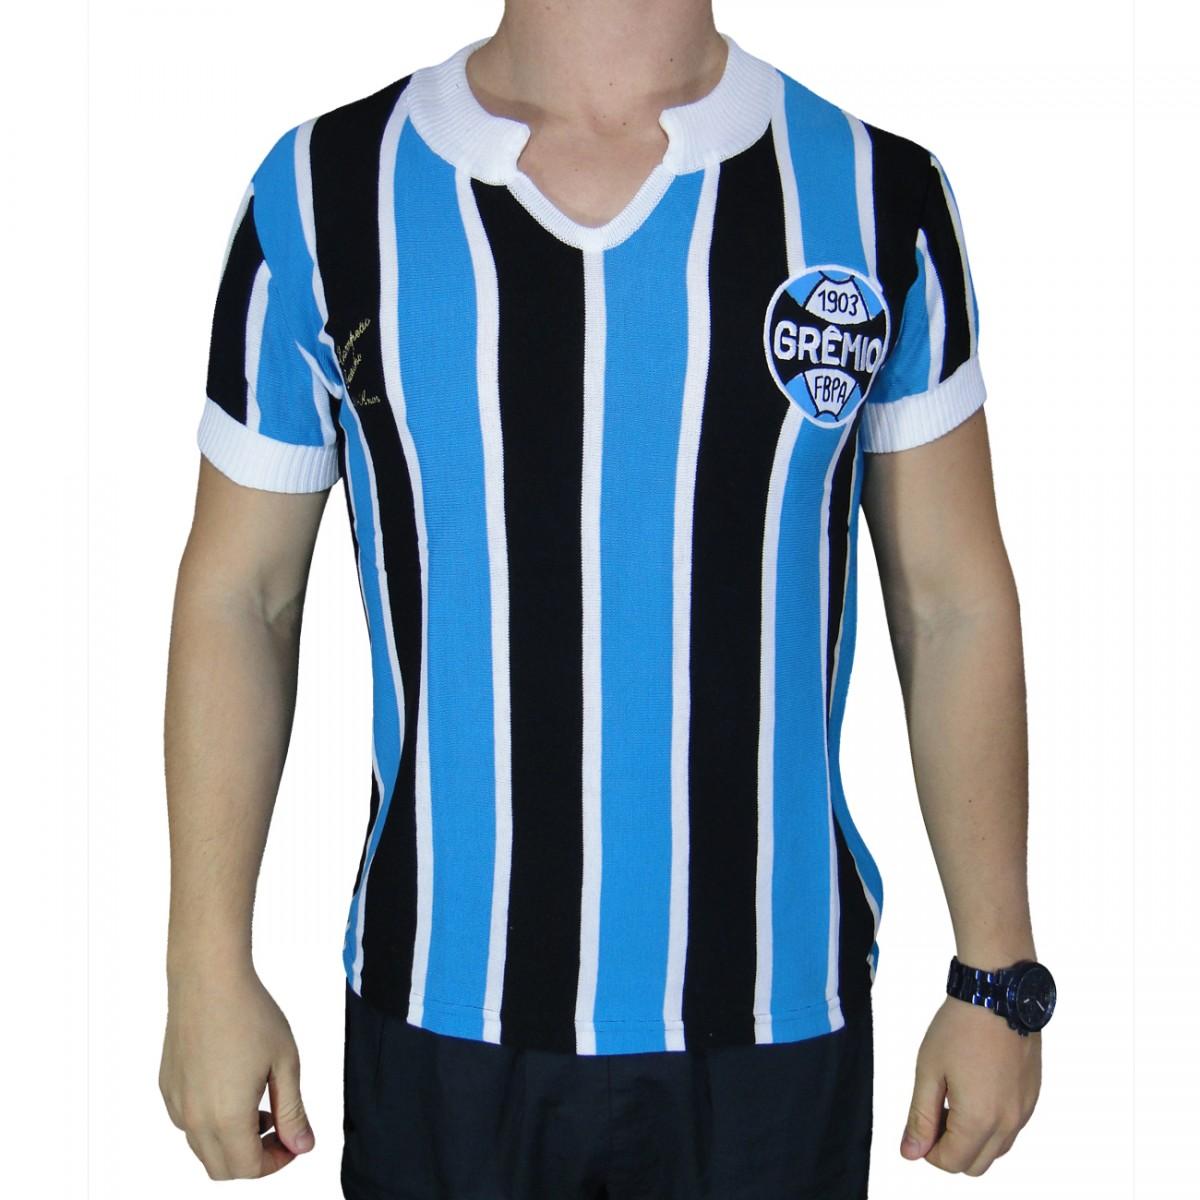 Camisa Gremio G34 Retro 1977 G3415 - Tricolor - Chuteira Nike ... b43b592d89728